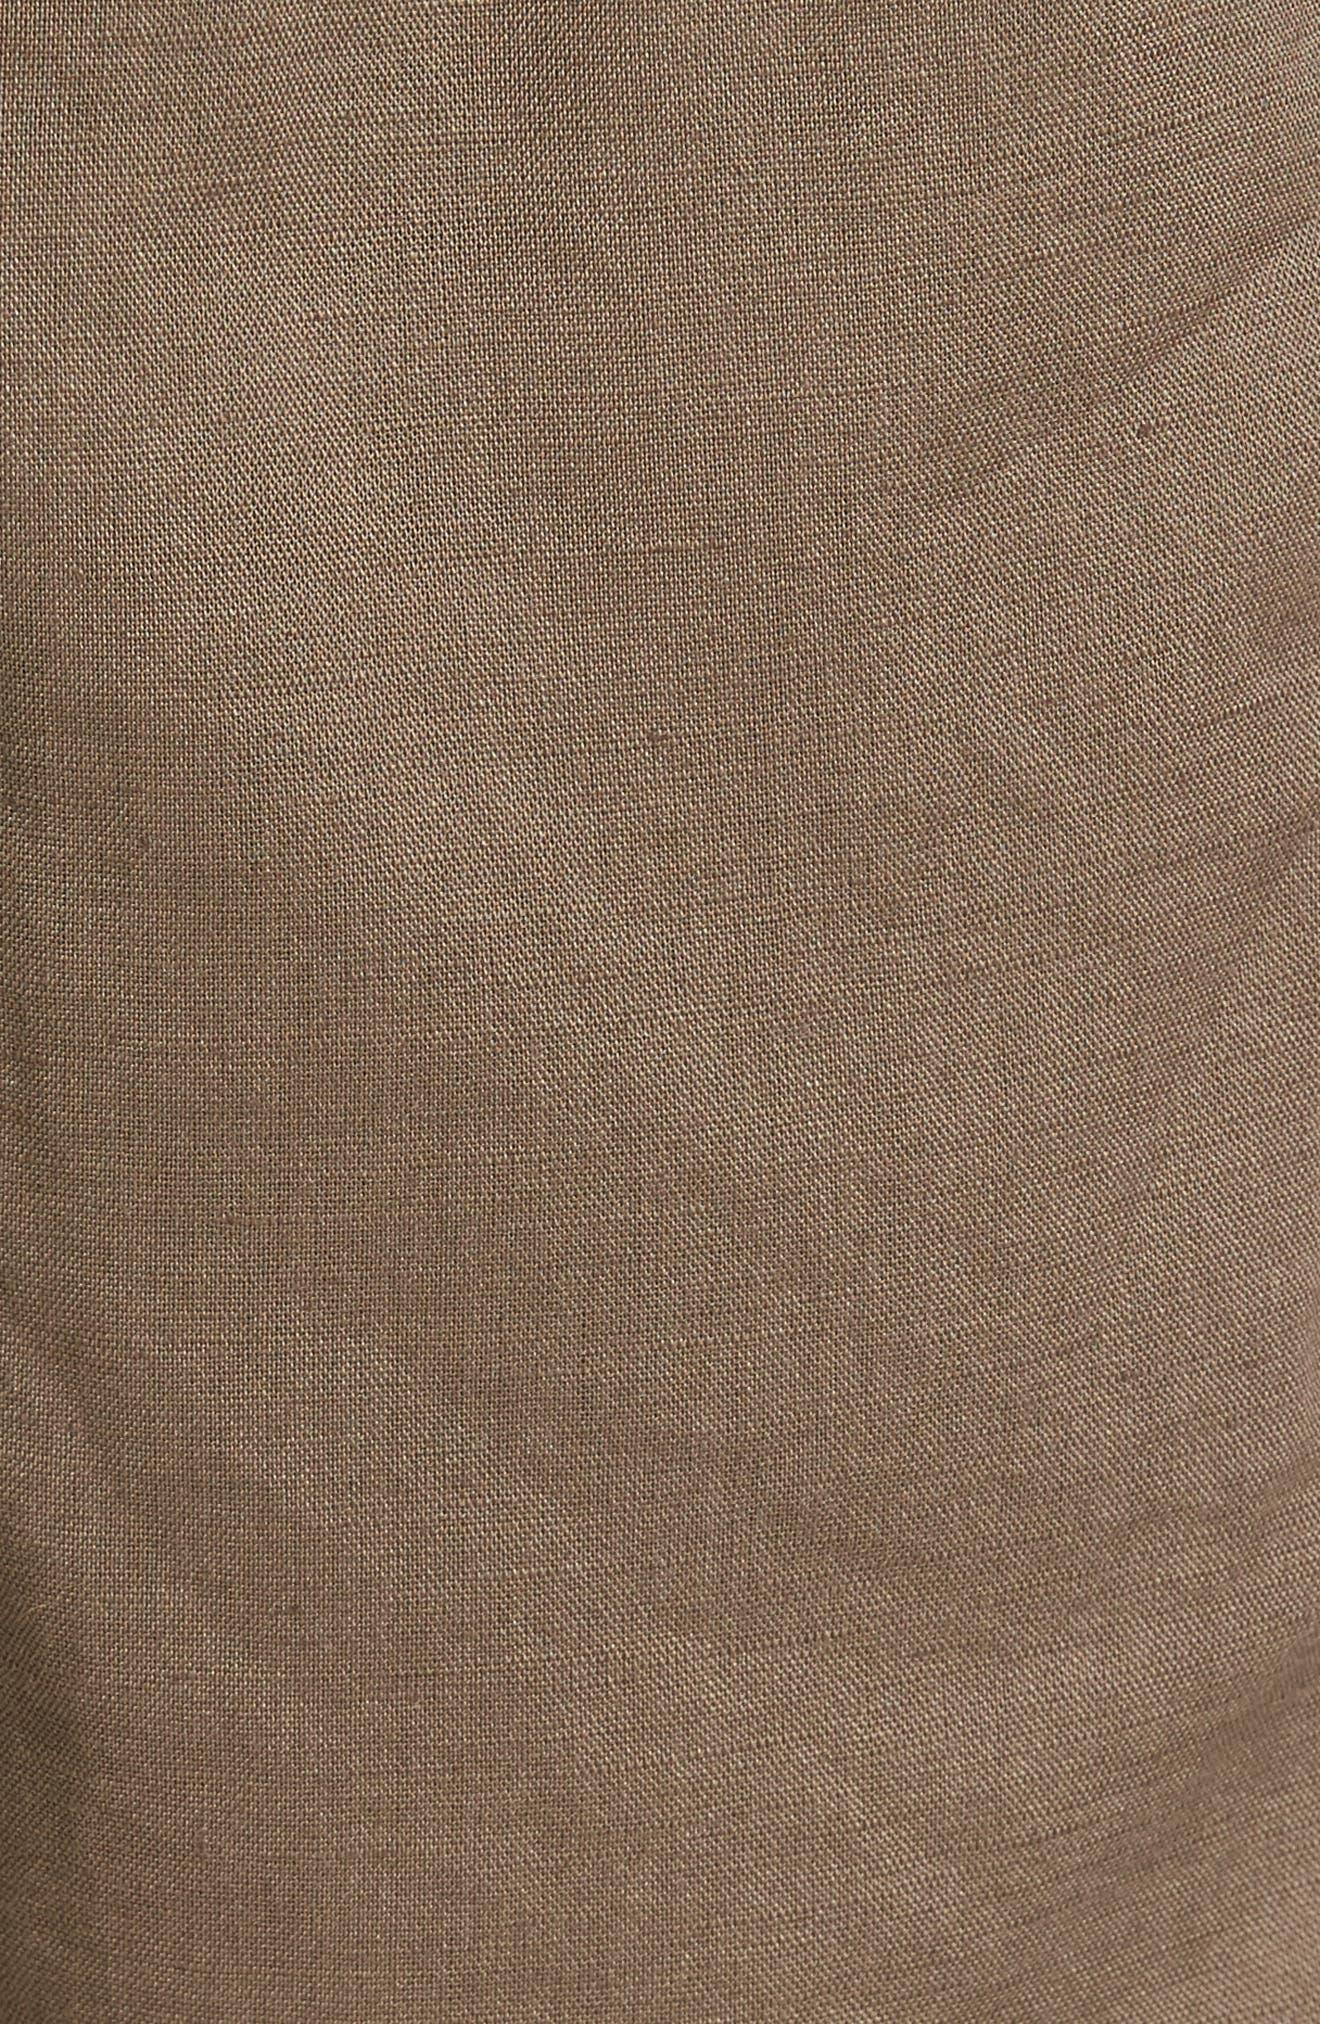 Omni Linen Blend Shorts,                             Alternate thumbnail 5, color,                             310